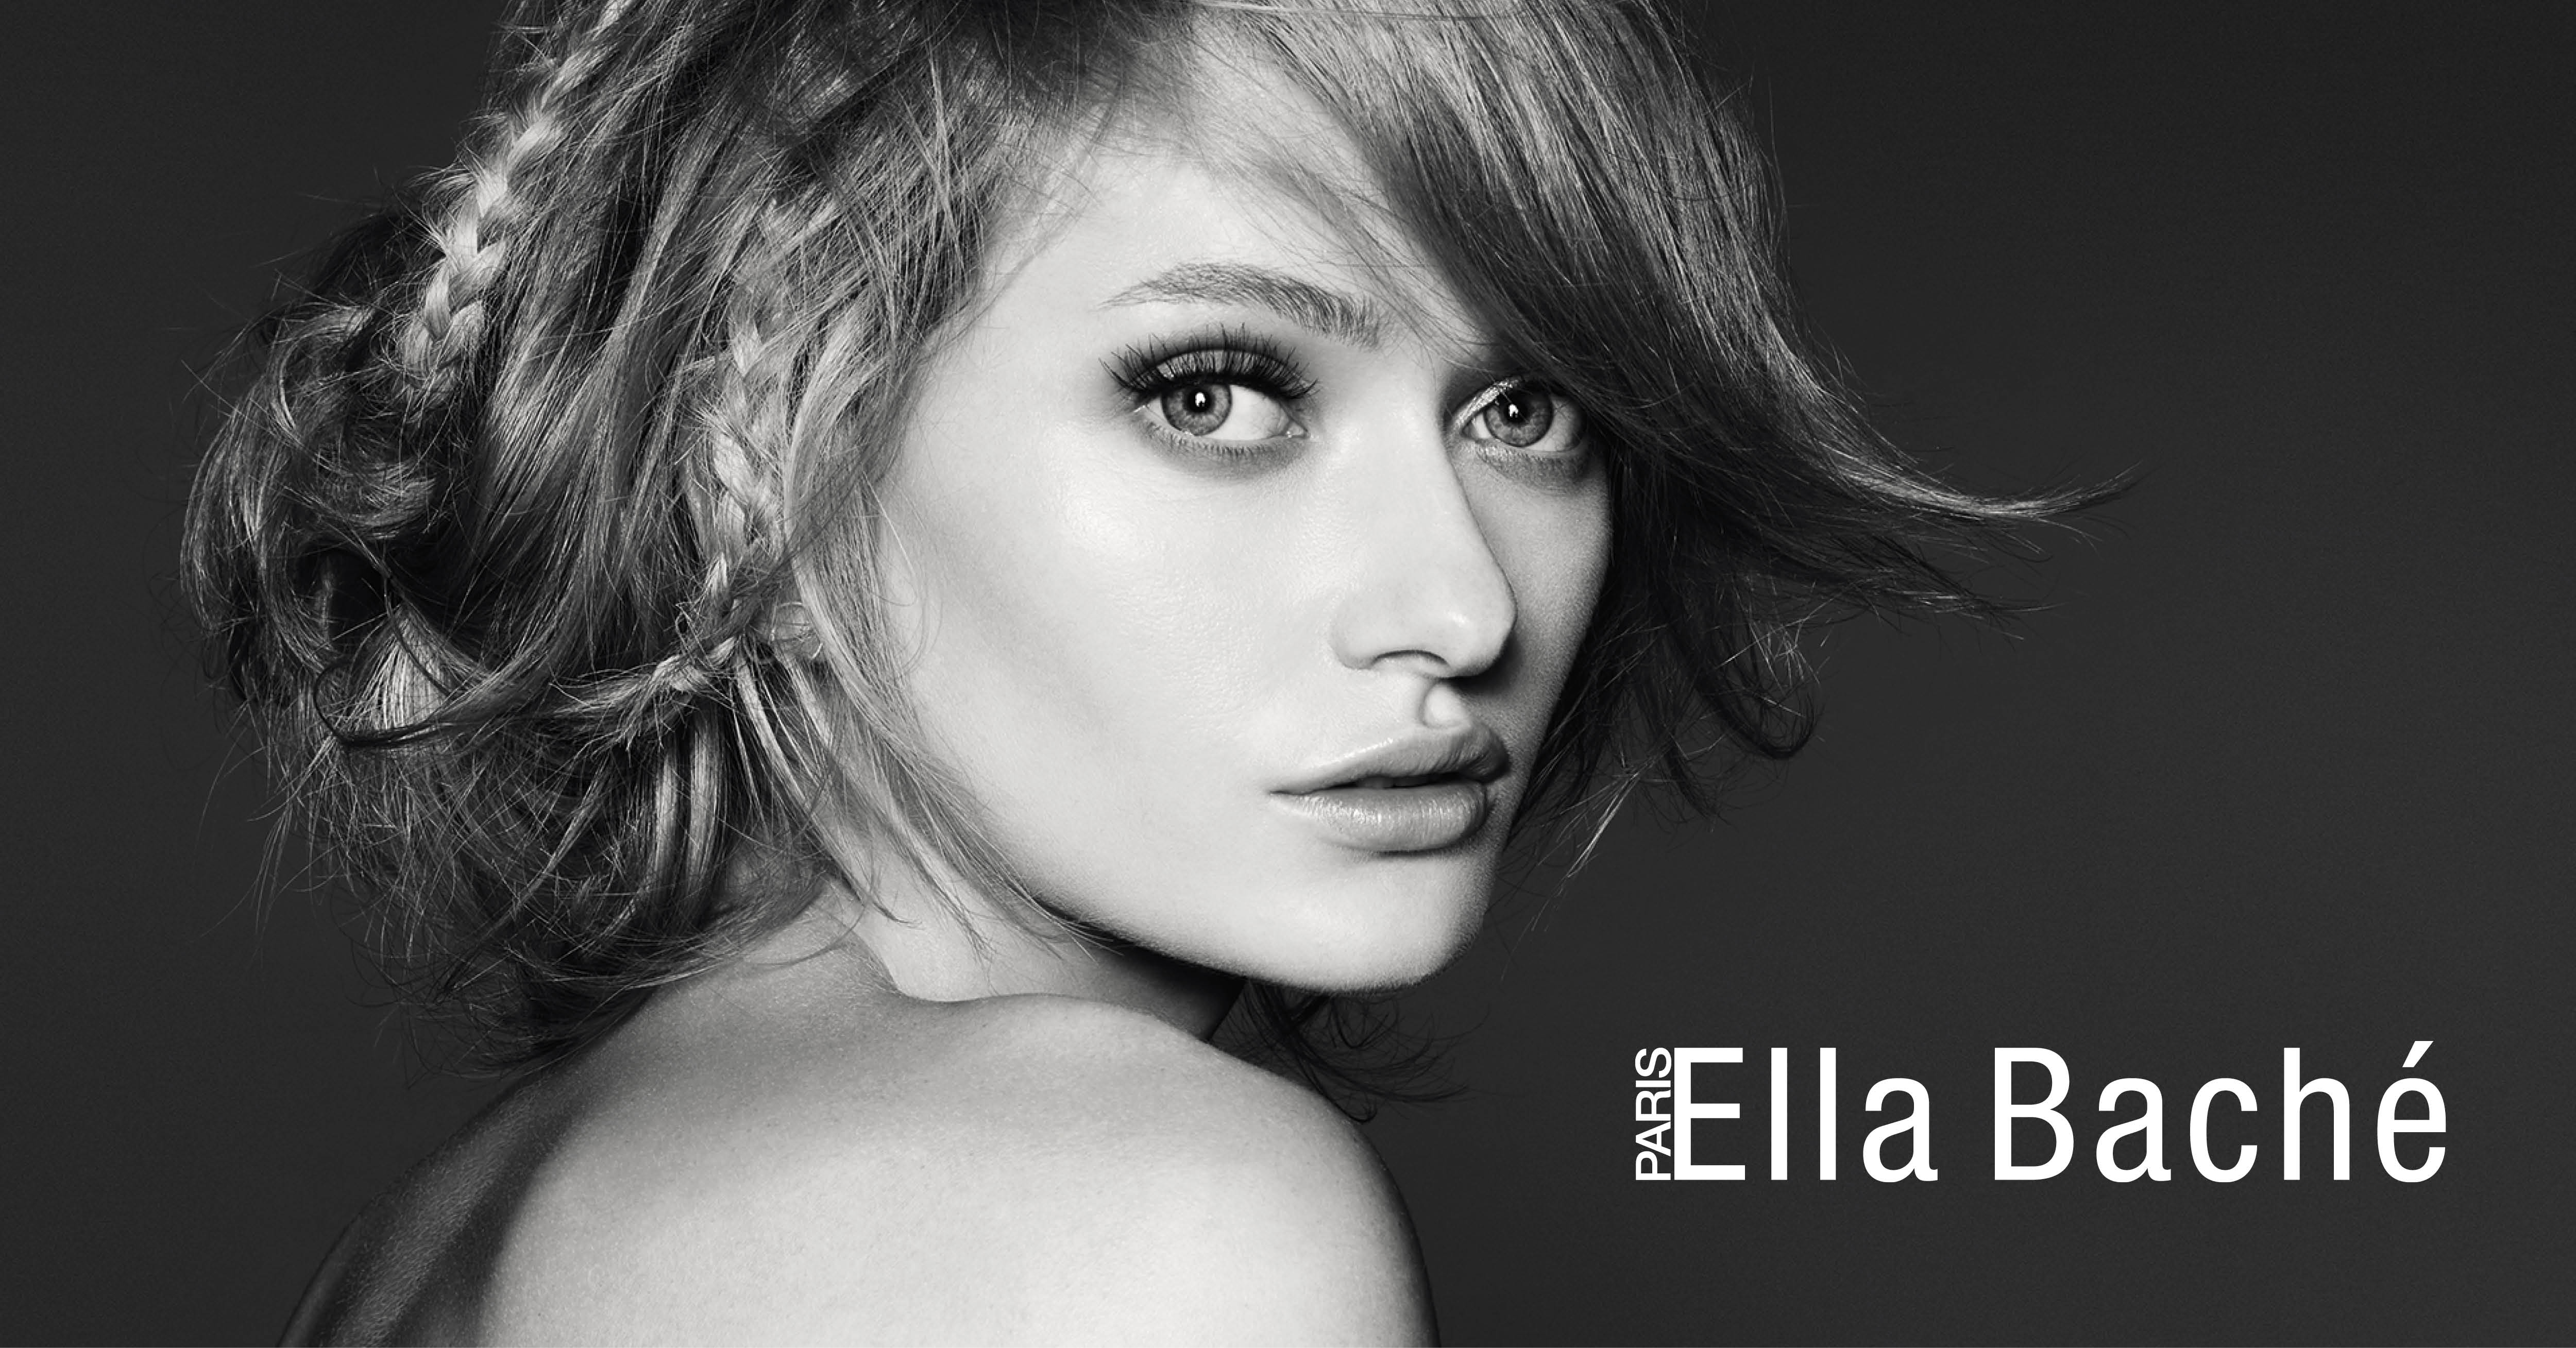 Ella Baché Beauty Salon | NEW Franchise Opportunities | Byron Bay NSW